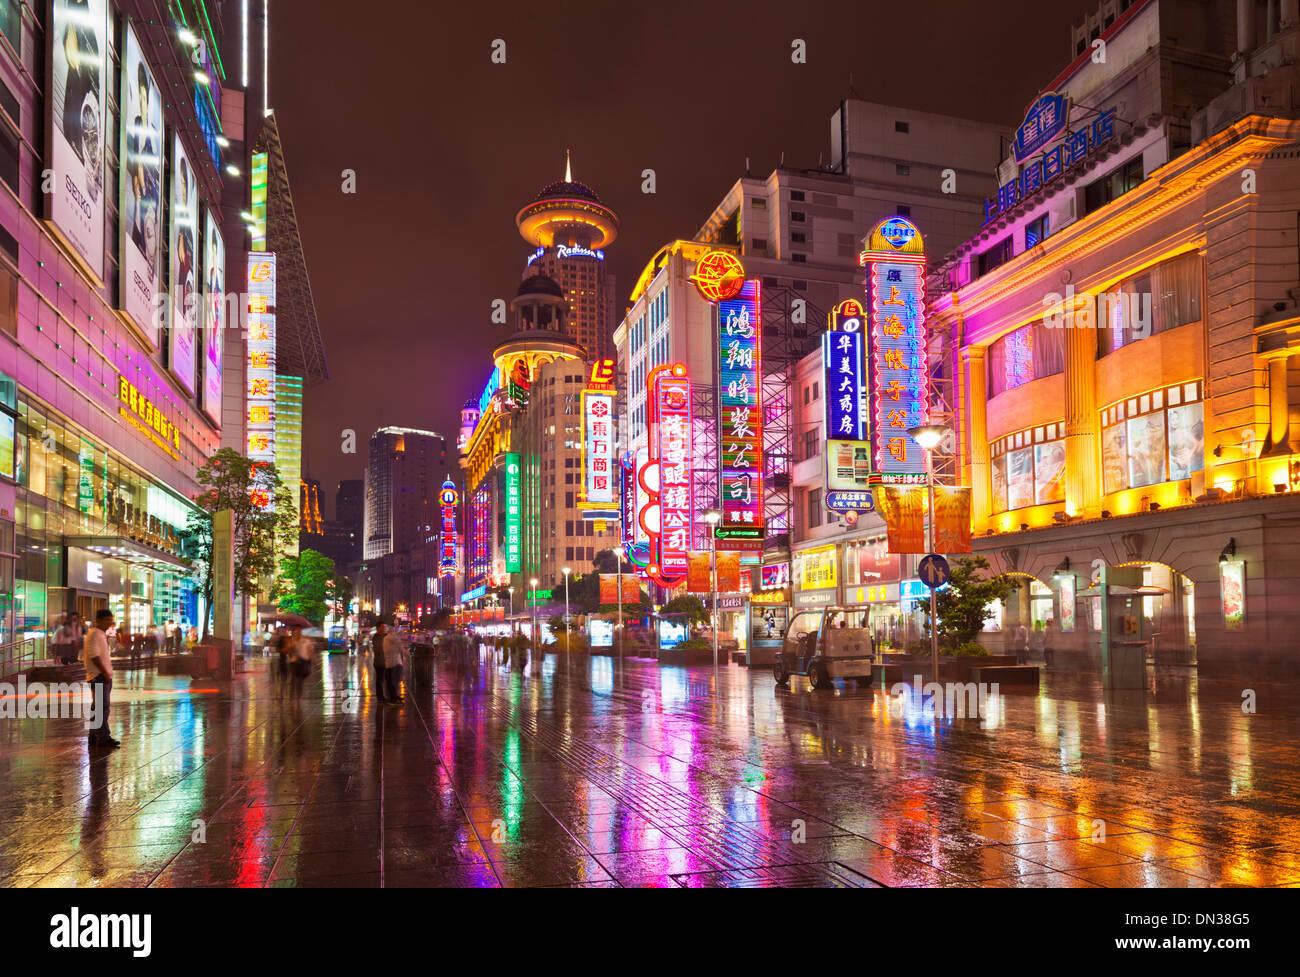 Nachtzeit auf Nanjing Road East, Shanghai City centre, Volksrepublik China, VR China, Asien Stockbild